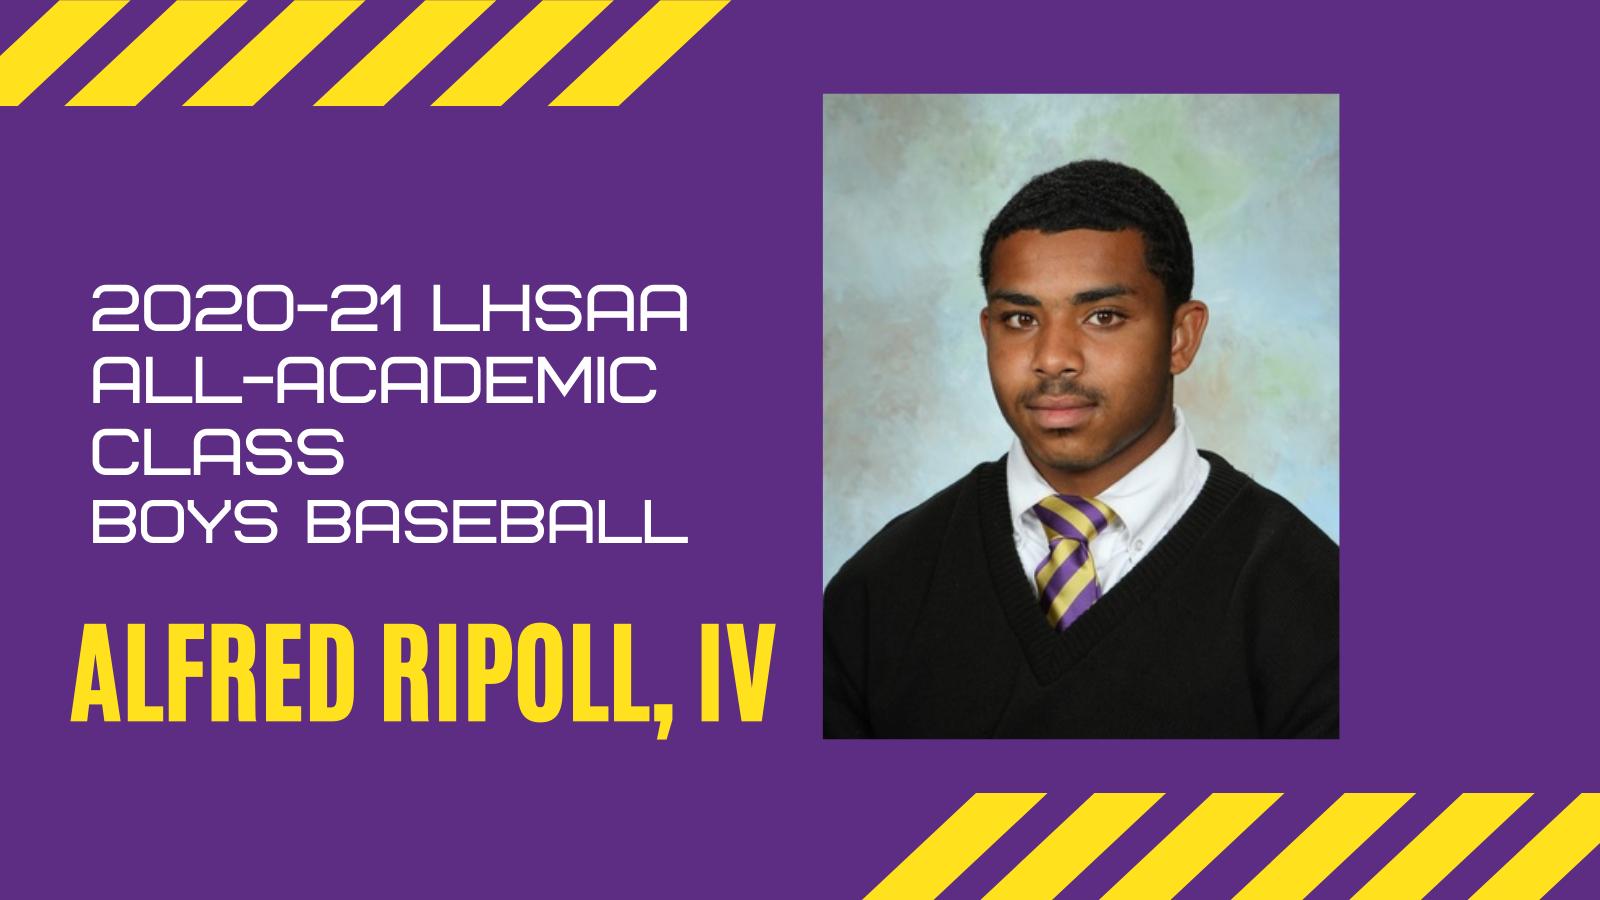 Ripoll named to LHSAA 2020-2021 Baseball All-Academic Class